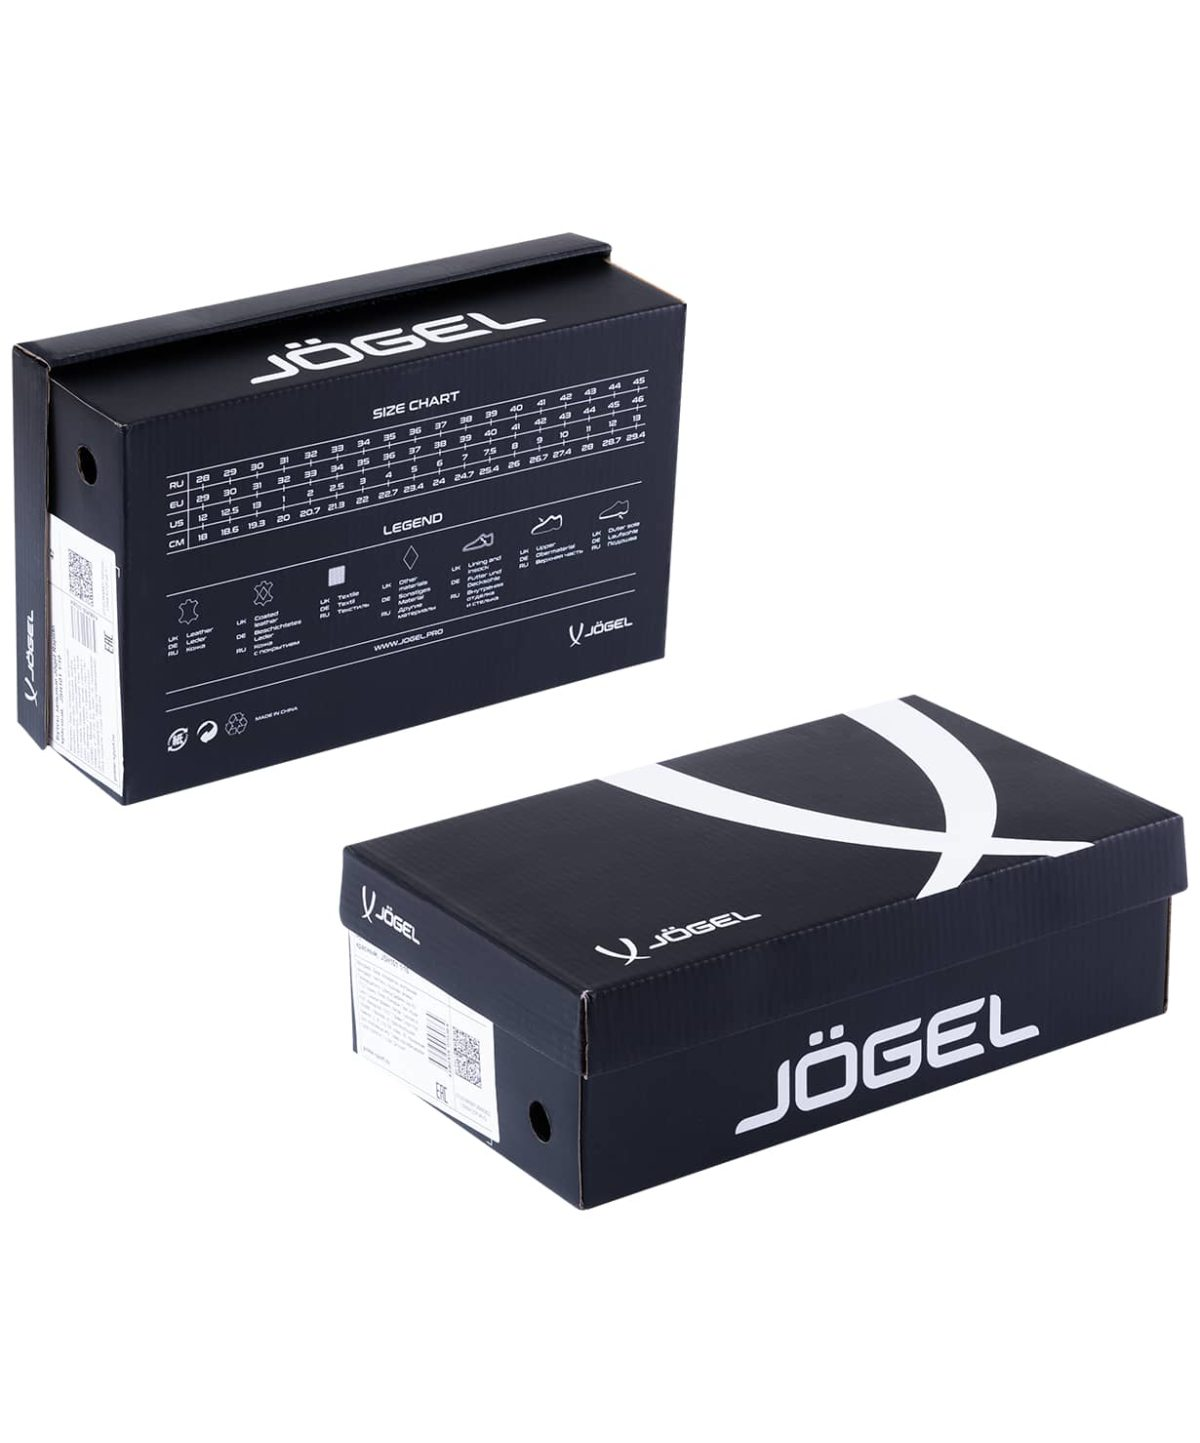 JOGEL Бутсы зальные Rapido р.39-40  JSH101Y: чёрный - 3